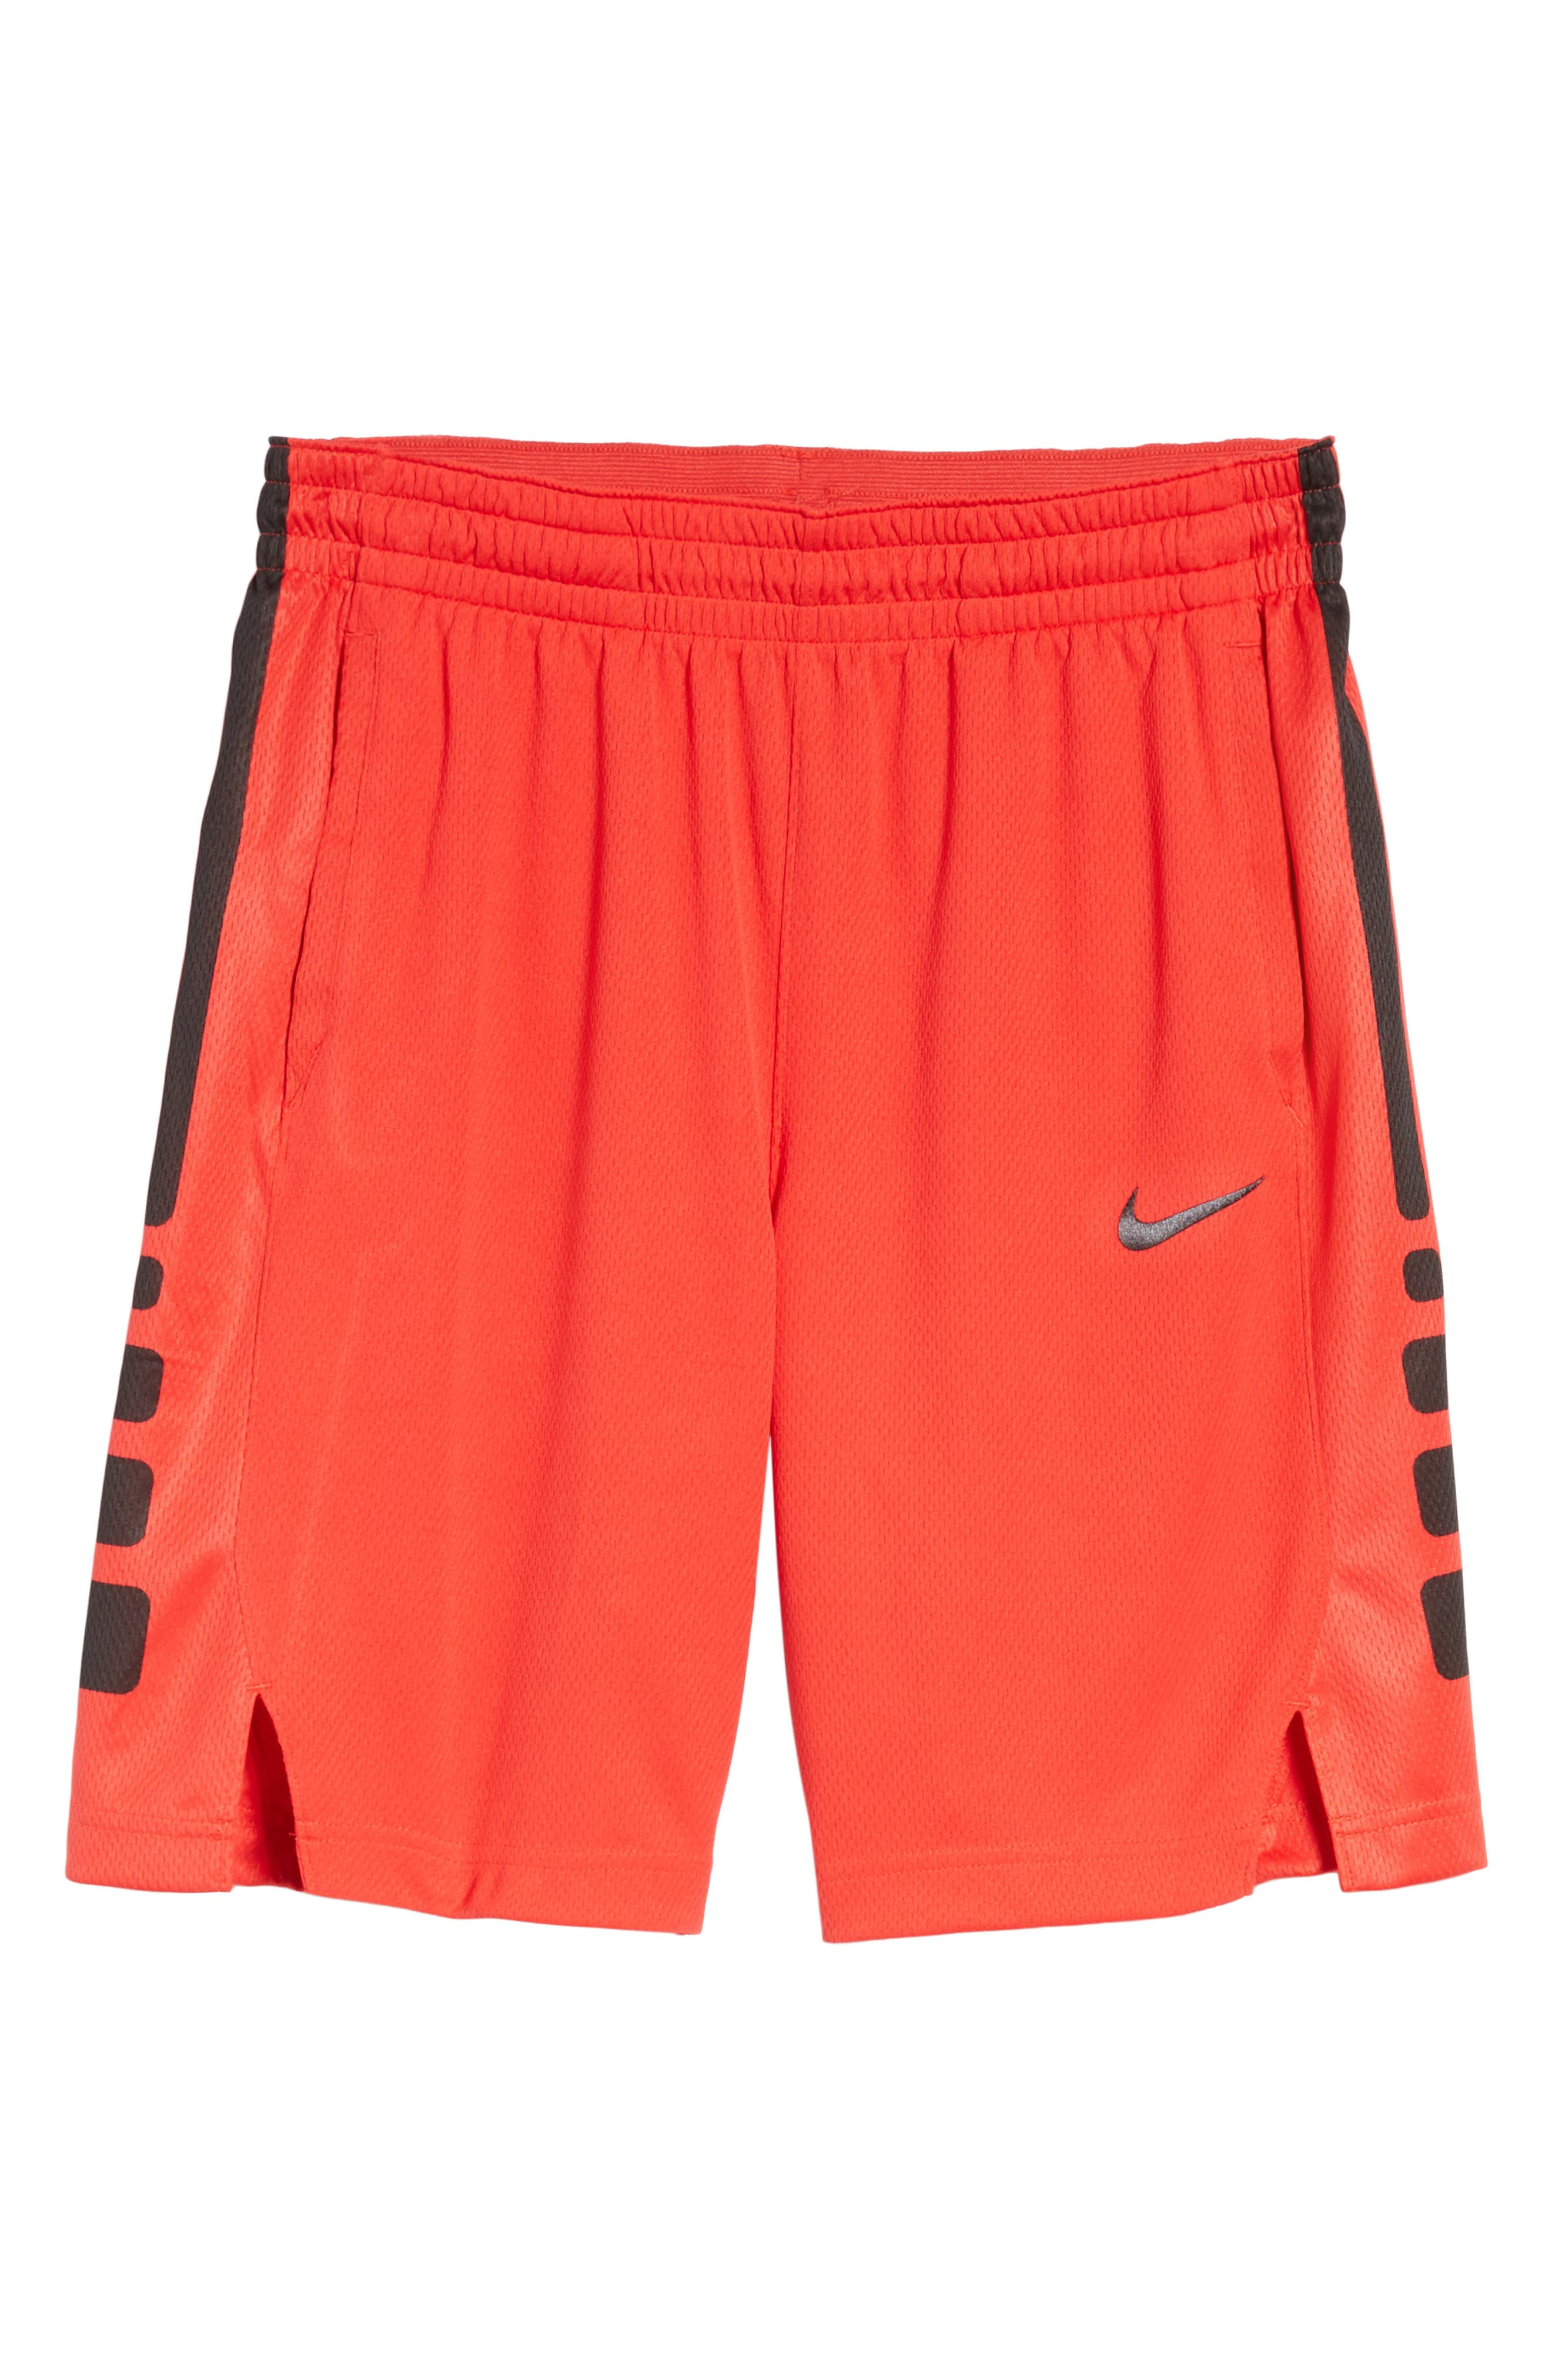 NIKE, Elite Stripe Basketball Shorts, Alternate thumbnail 7, color, 607